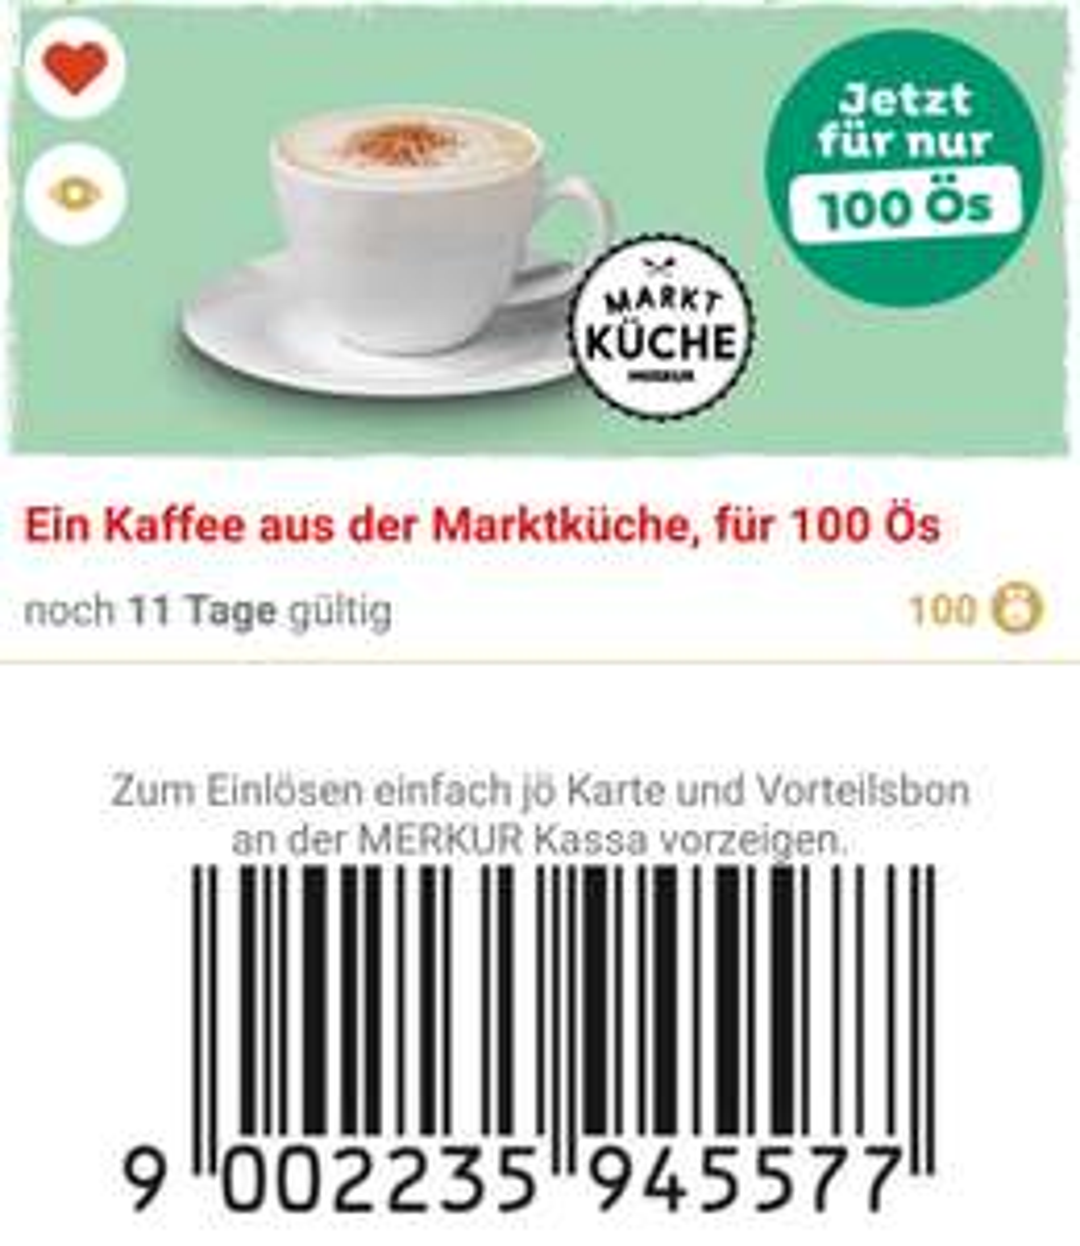 Gratis Kaffee bei Merkur für 100 Ös